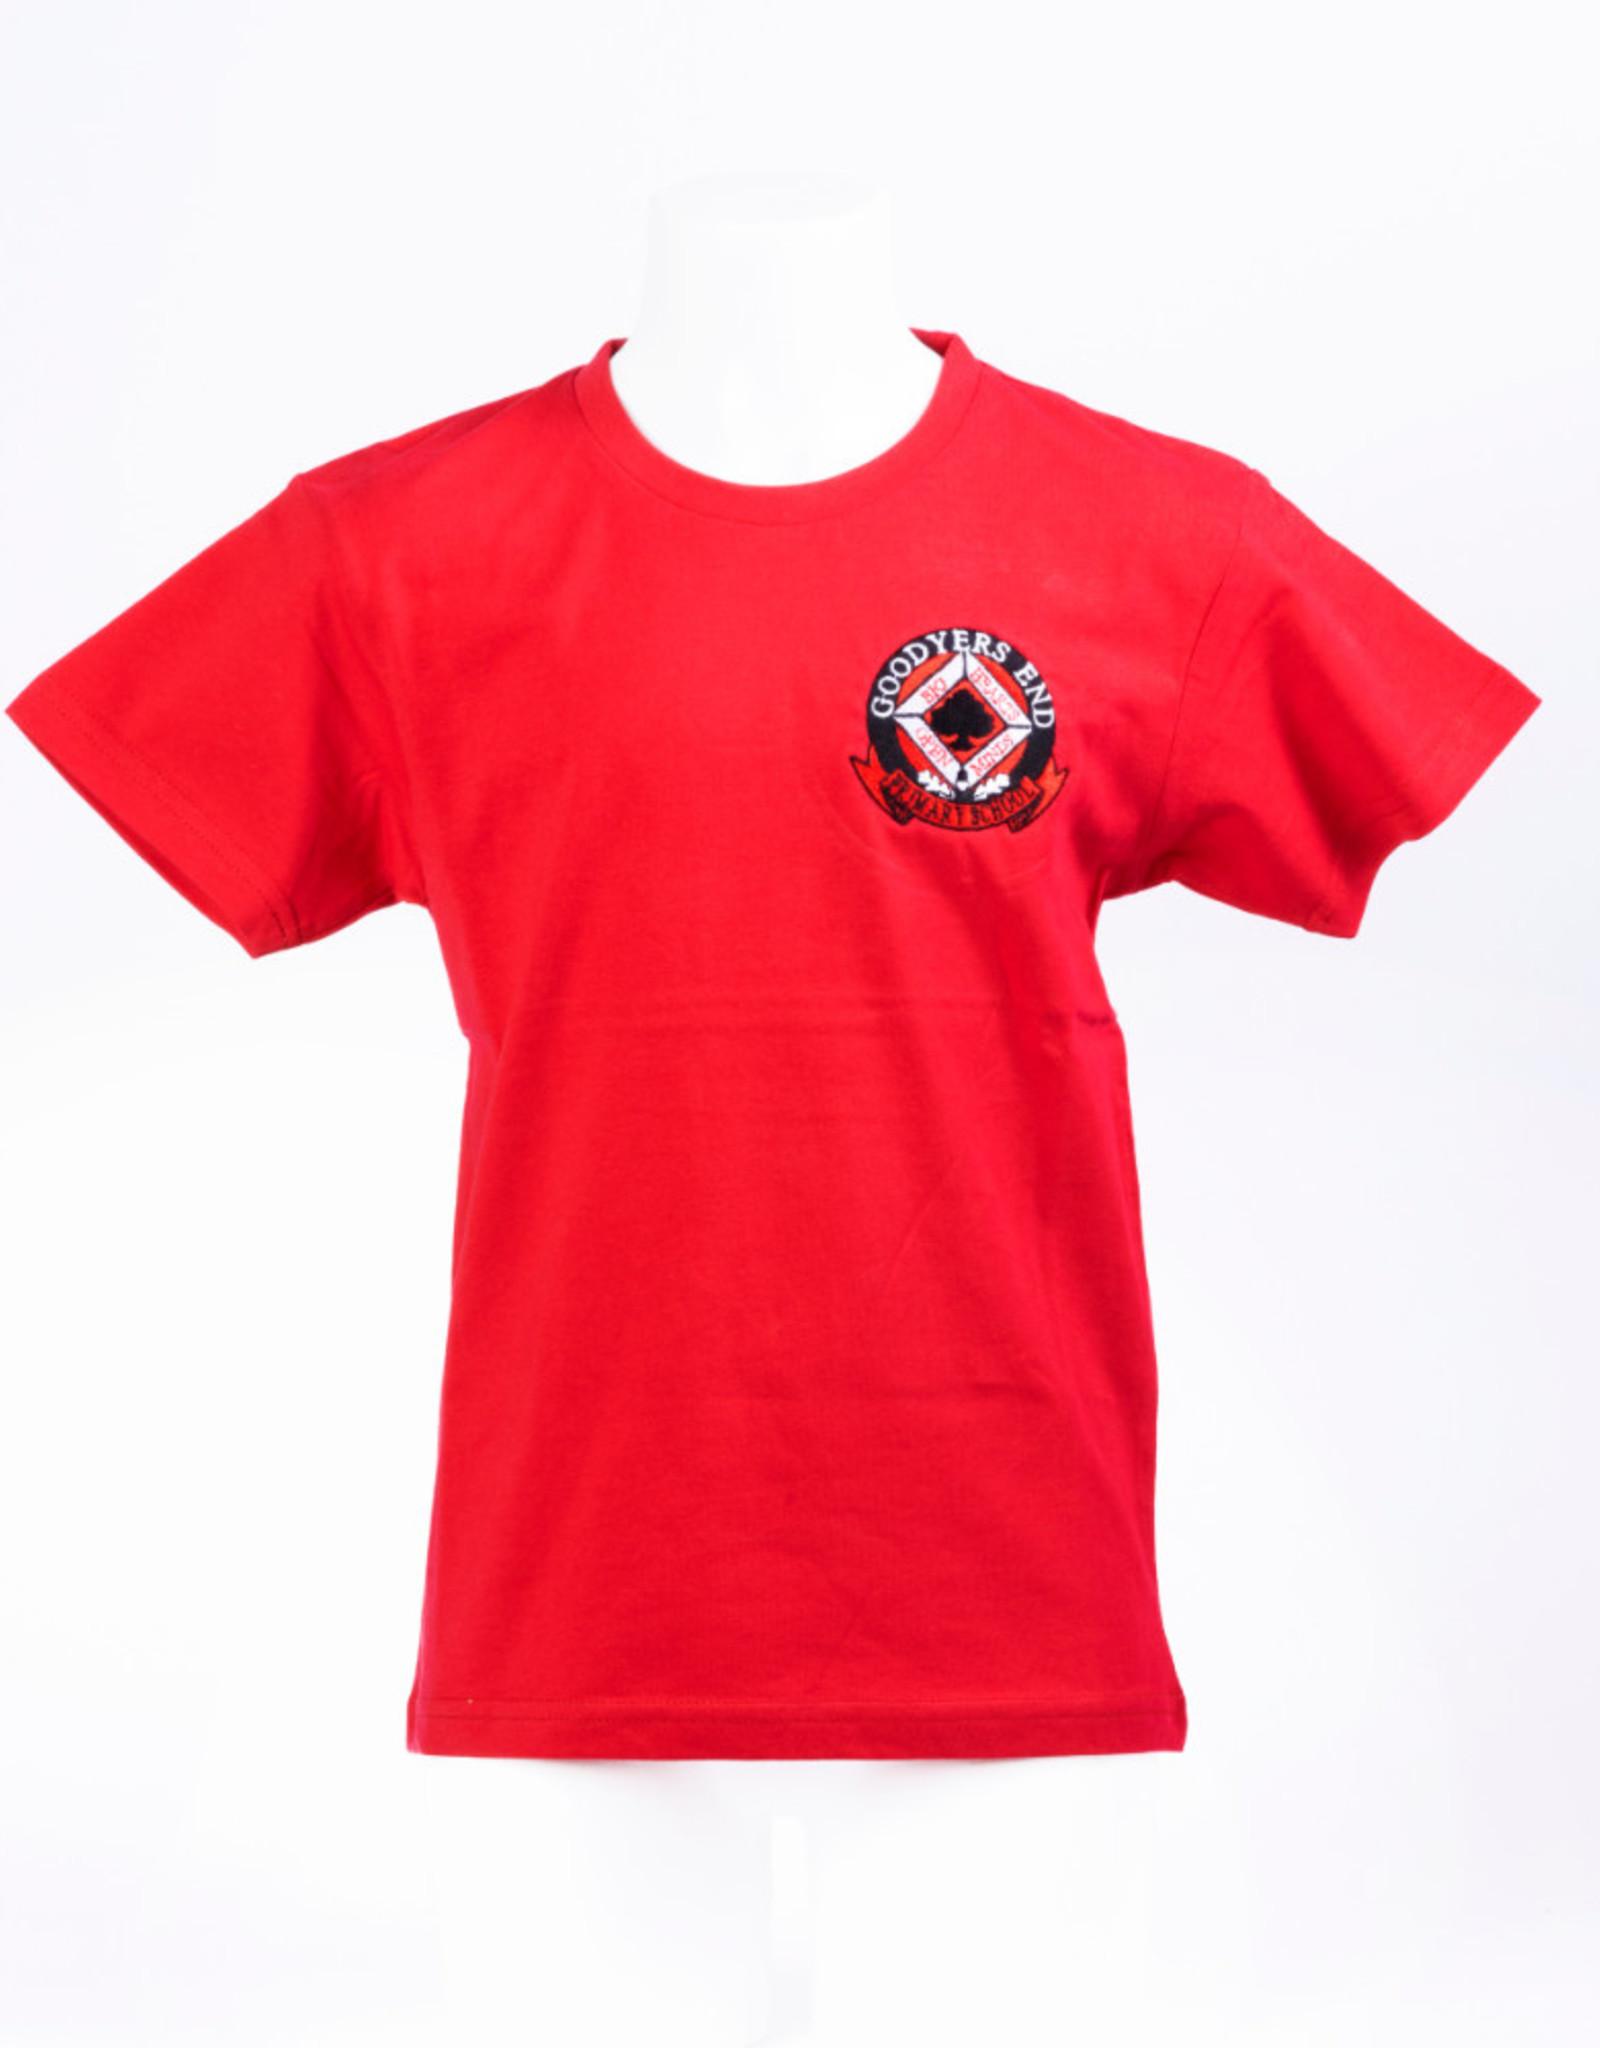 UNEEK T-Shirt Child Size - Goodyers End School